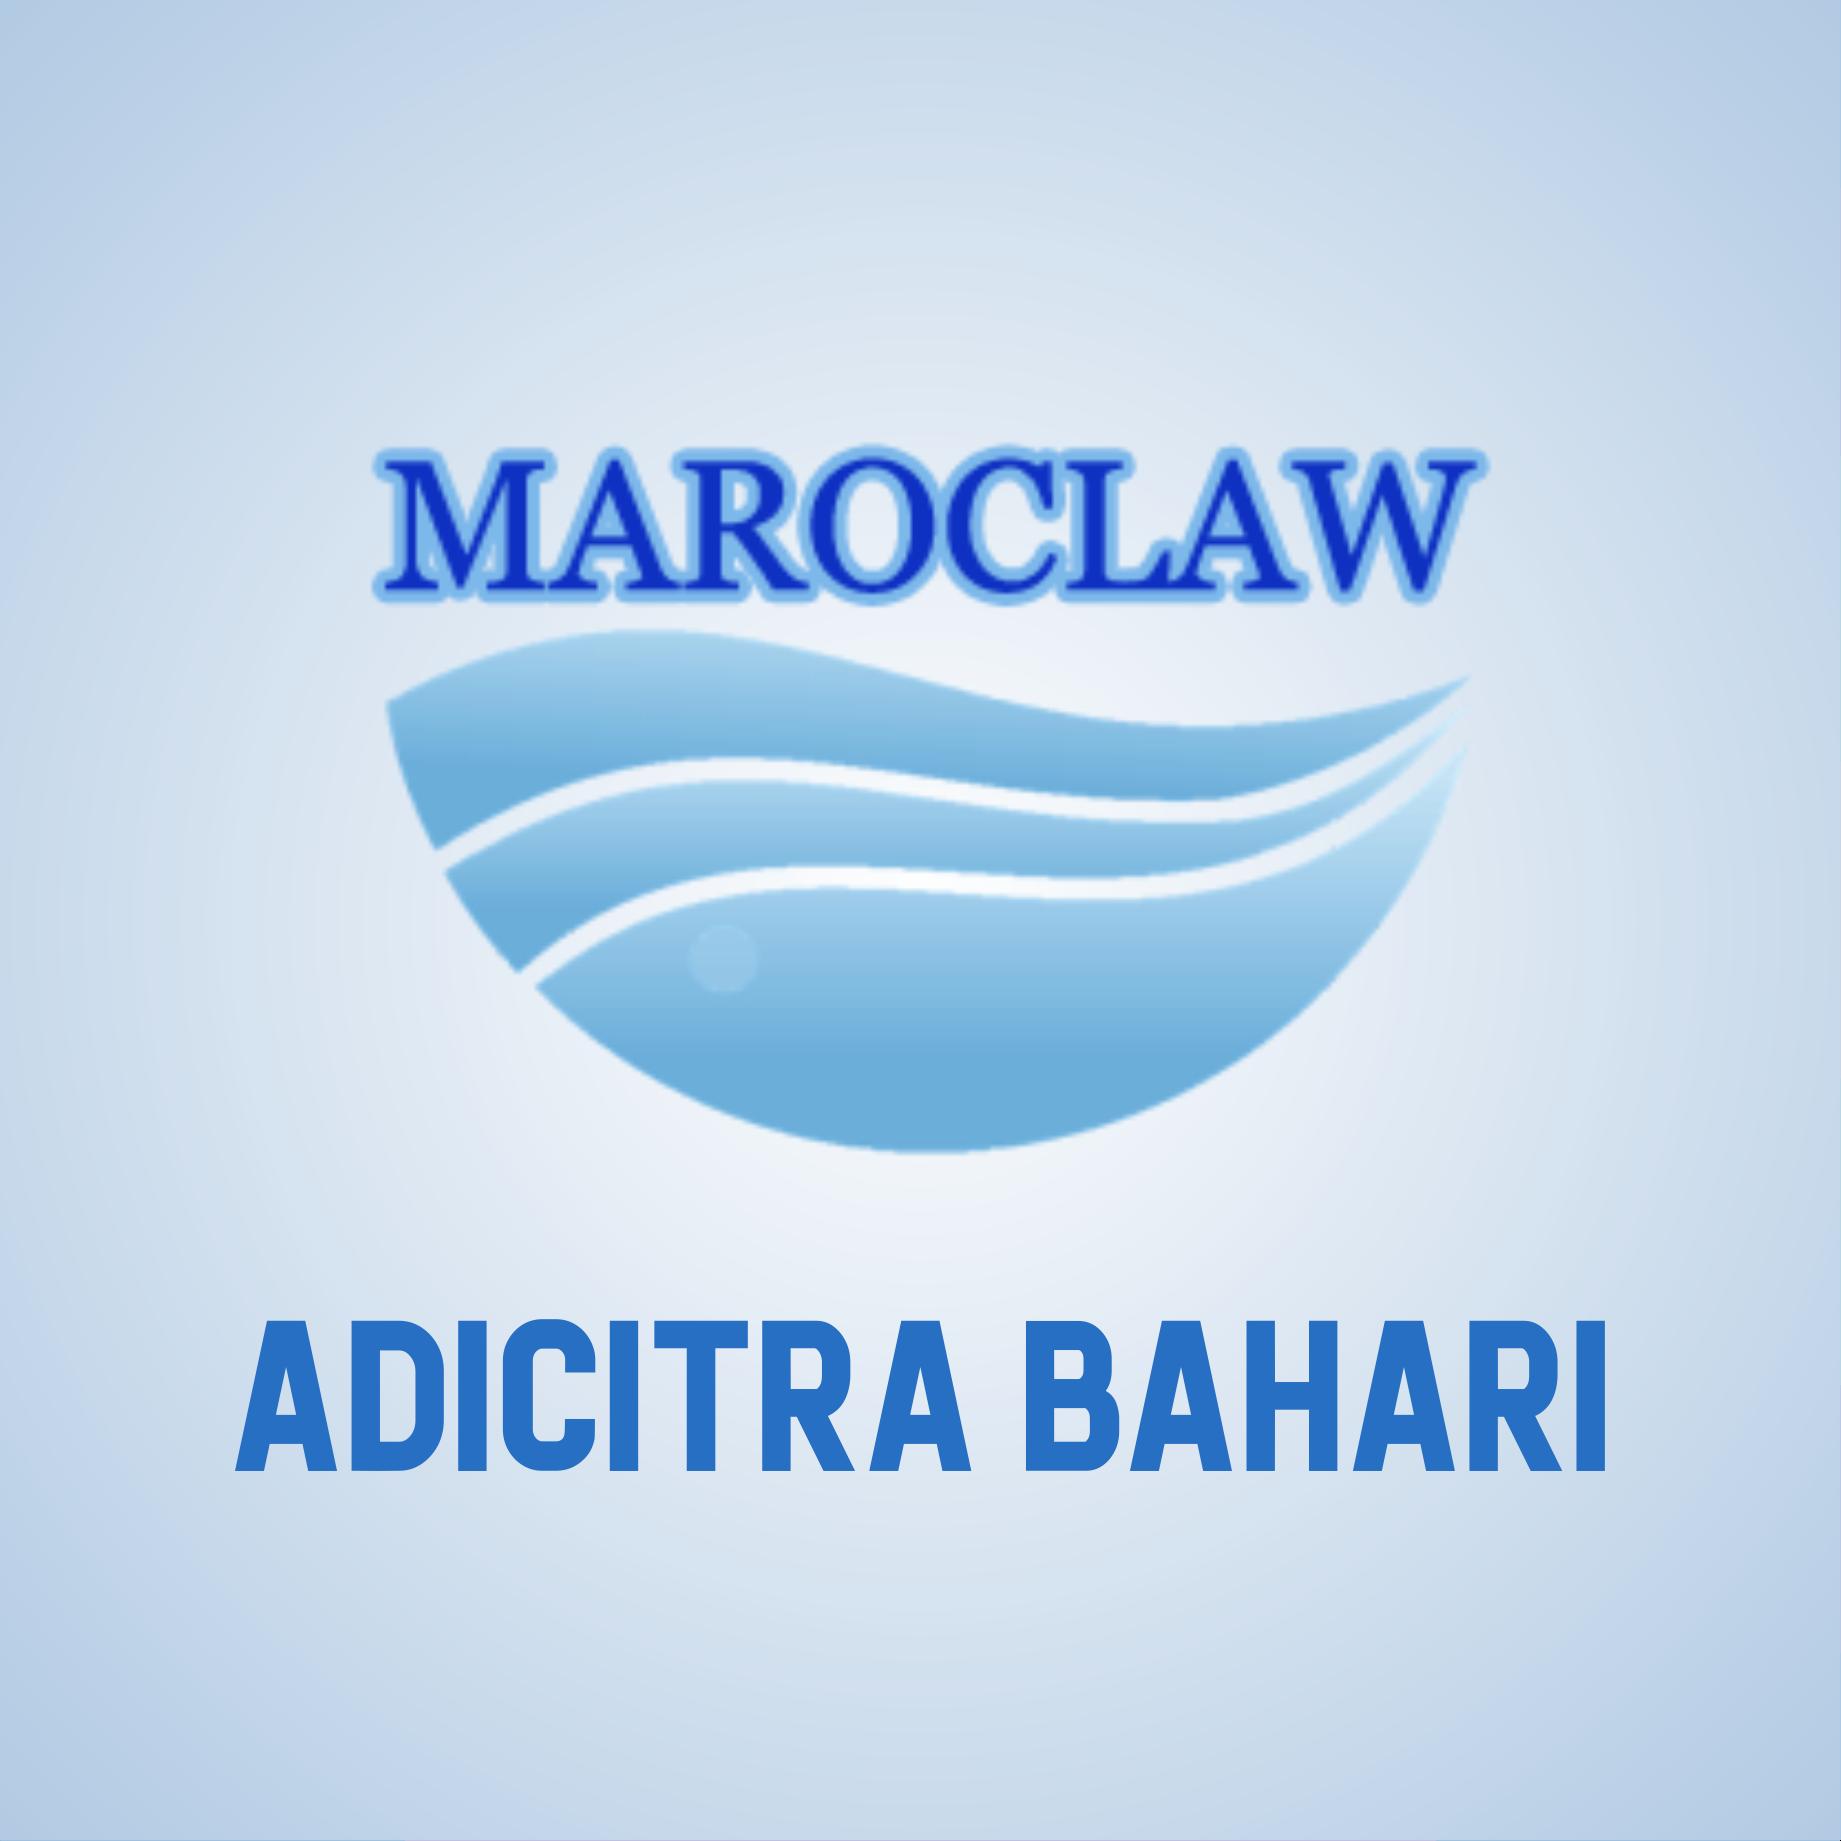 Adicitra Bahari MAROCLAW